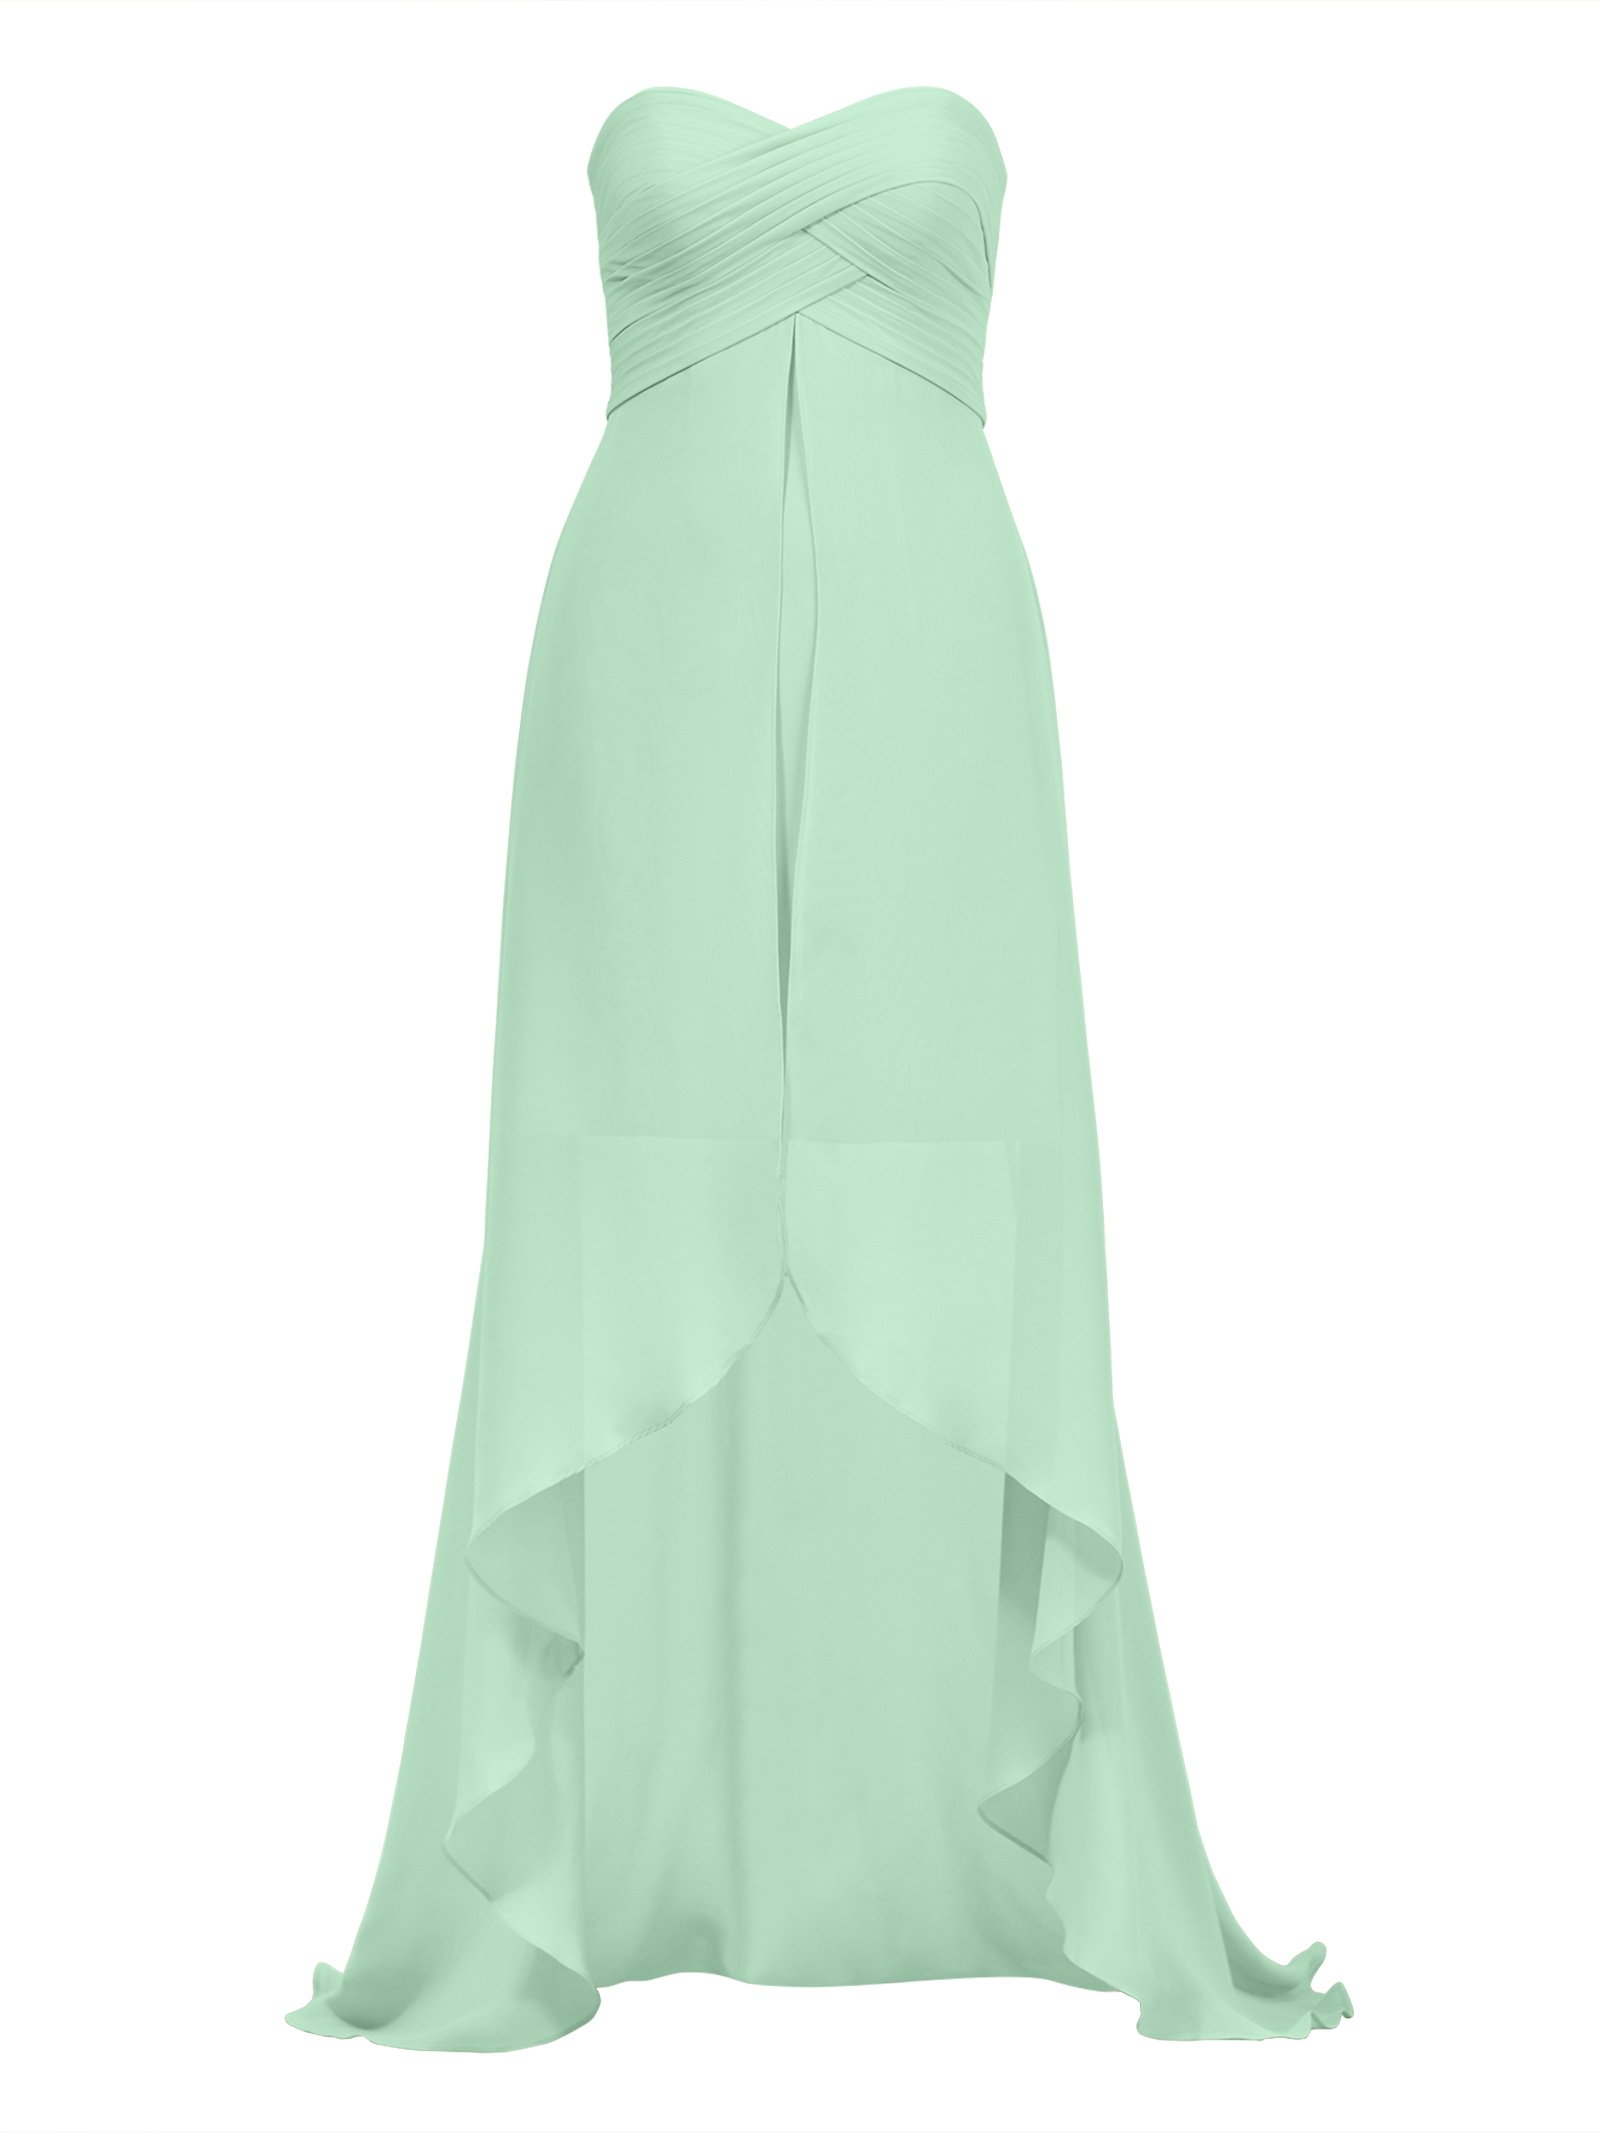 Alicepub Hi-Lo Chiffon Bridesmaid Dress Sweetheart Women's Evening Party Dresses